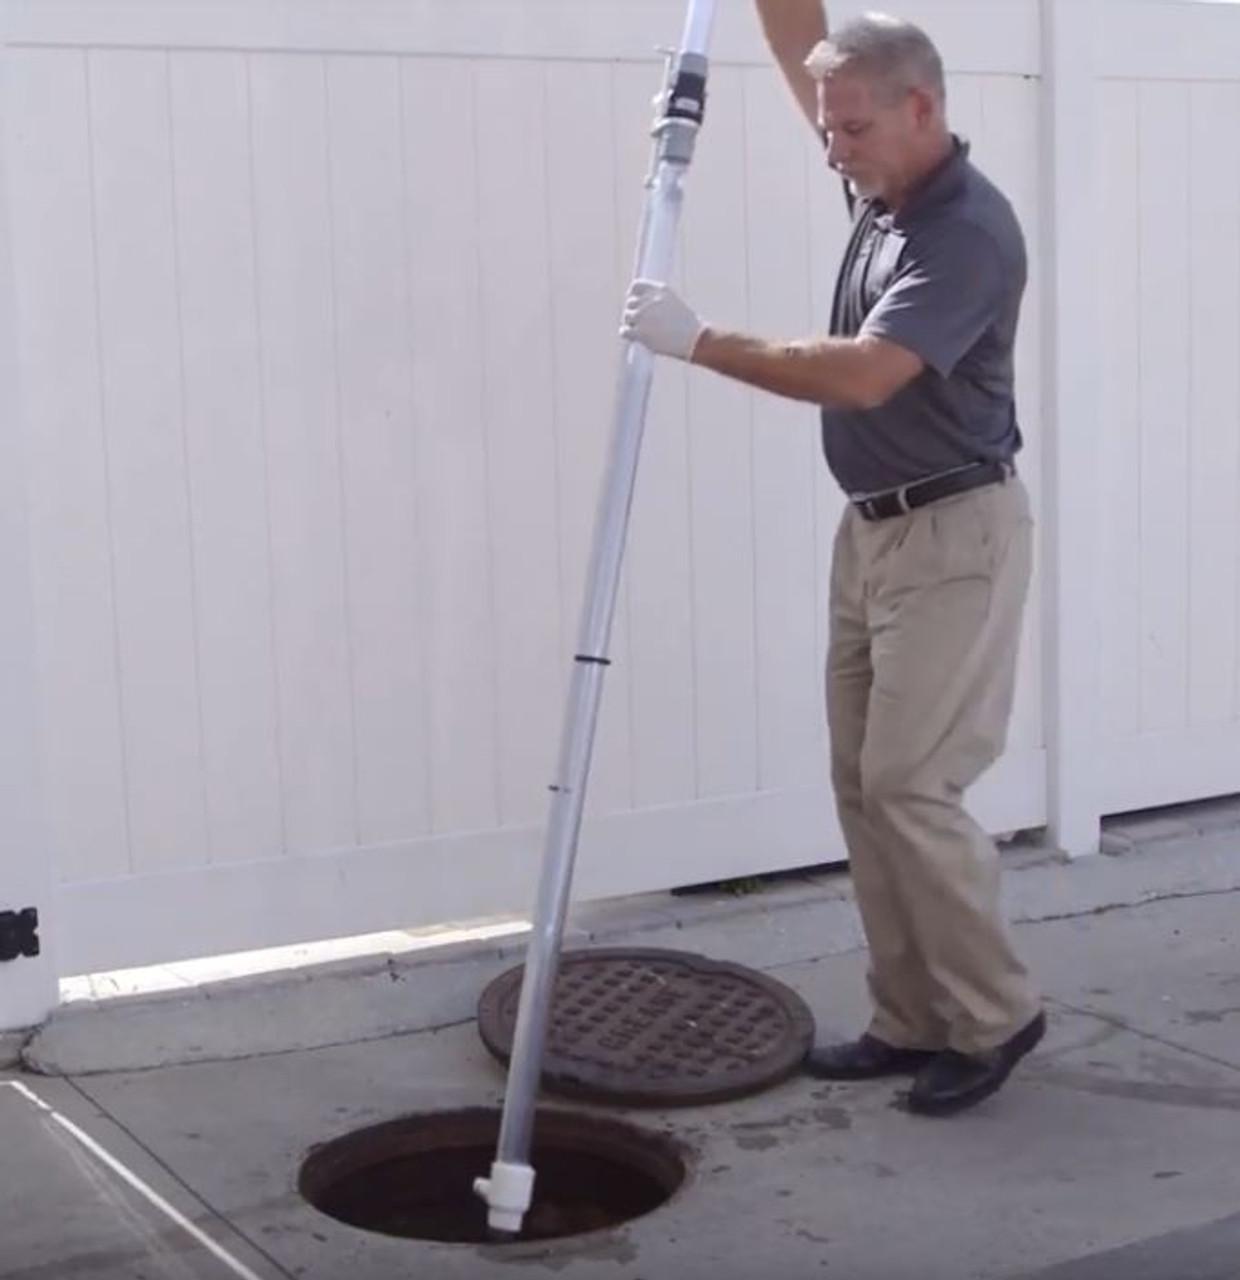 DipStick Pro™ Grease Trap & Tank Sampler to measure Sludge (6 feet long)